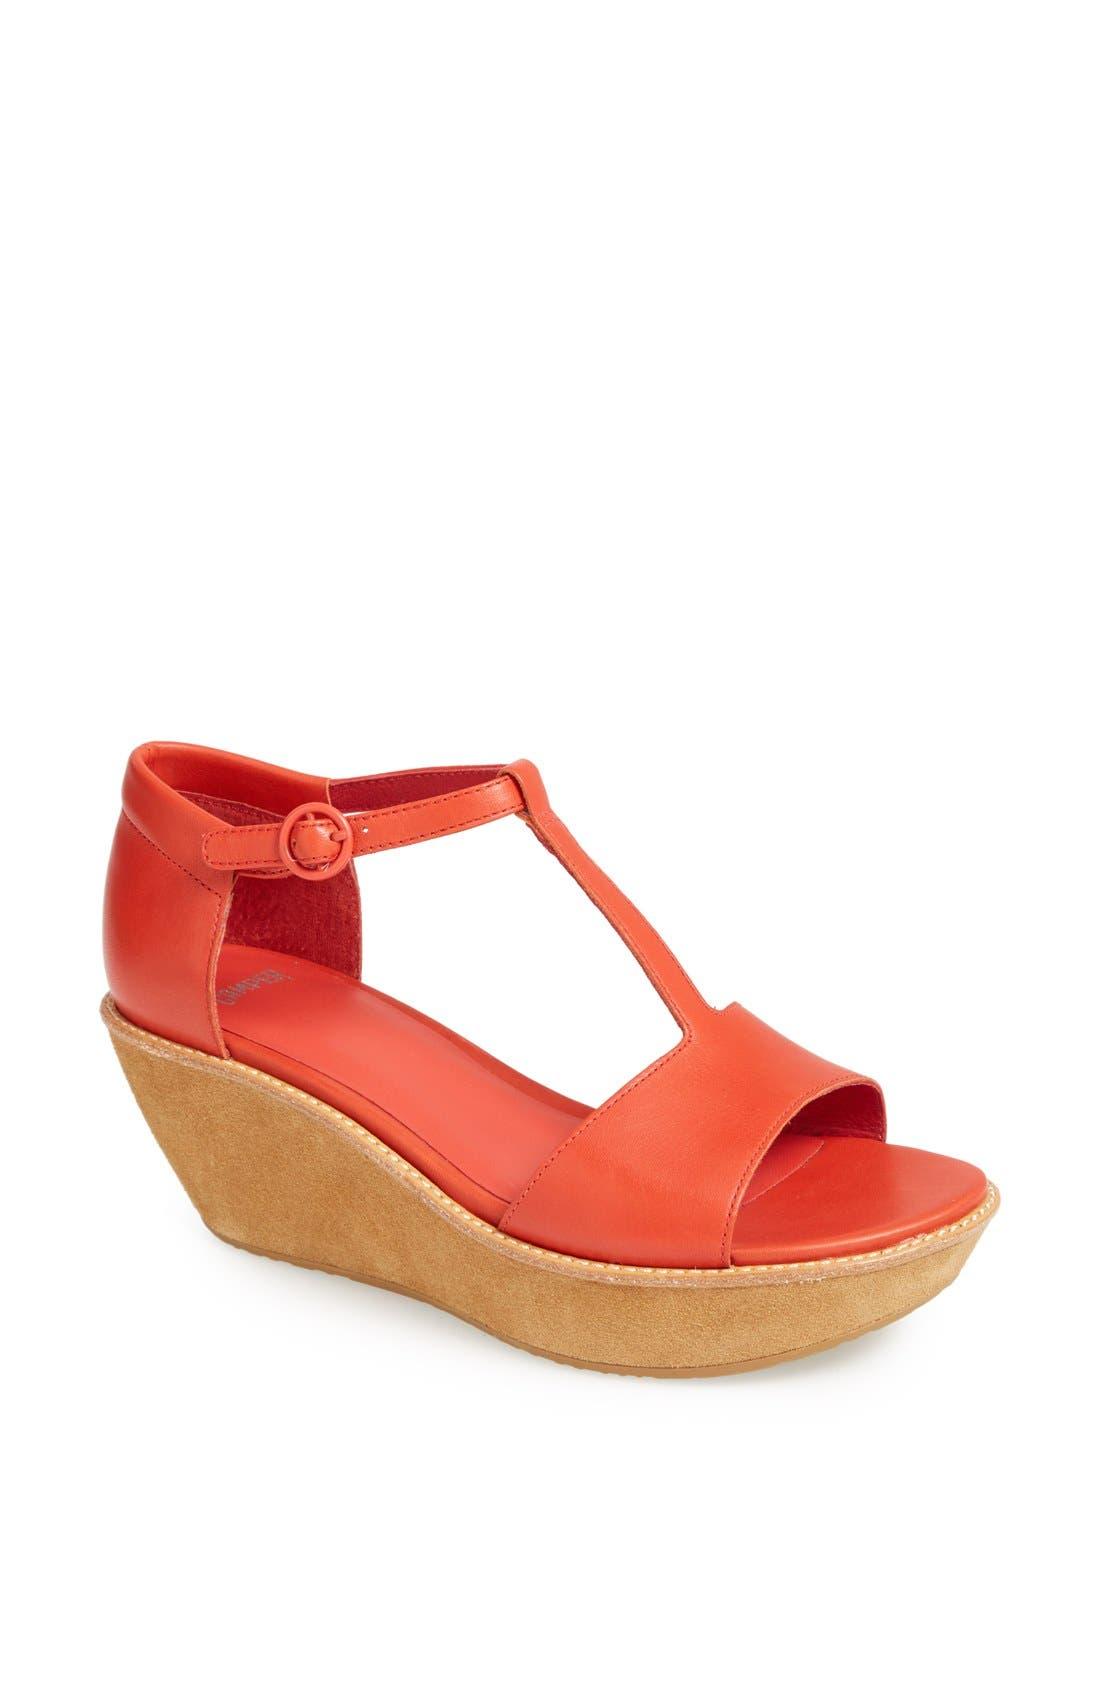 Alternate Image 1 Selected - Camper 'Damas' T-Strap Wedge Sandal